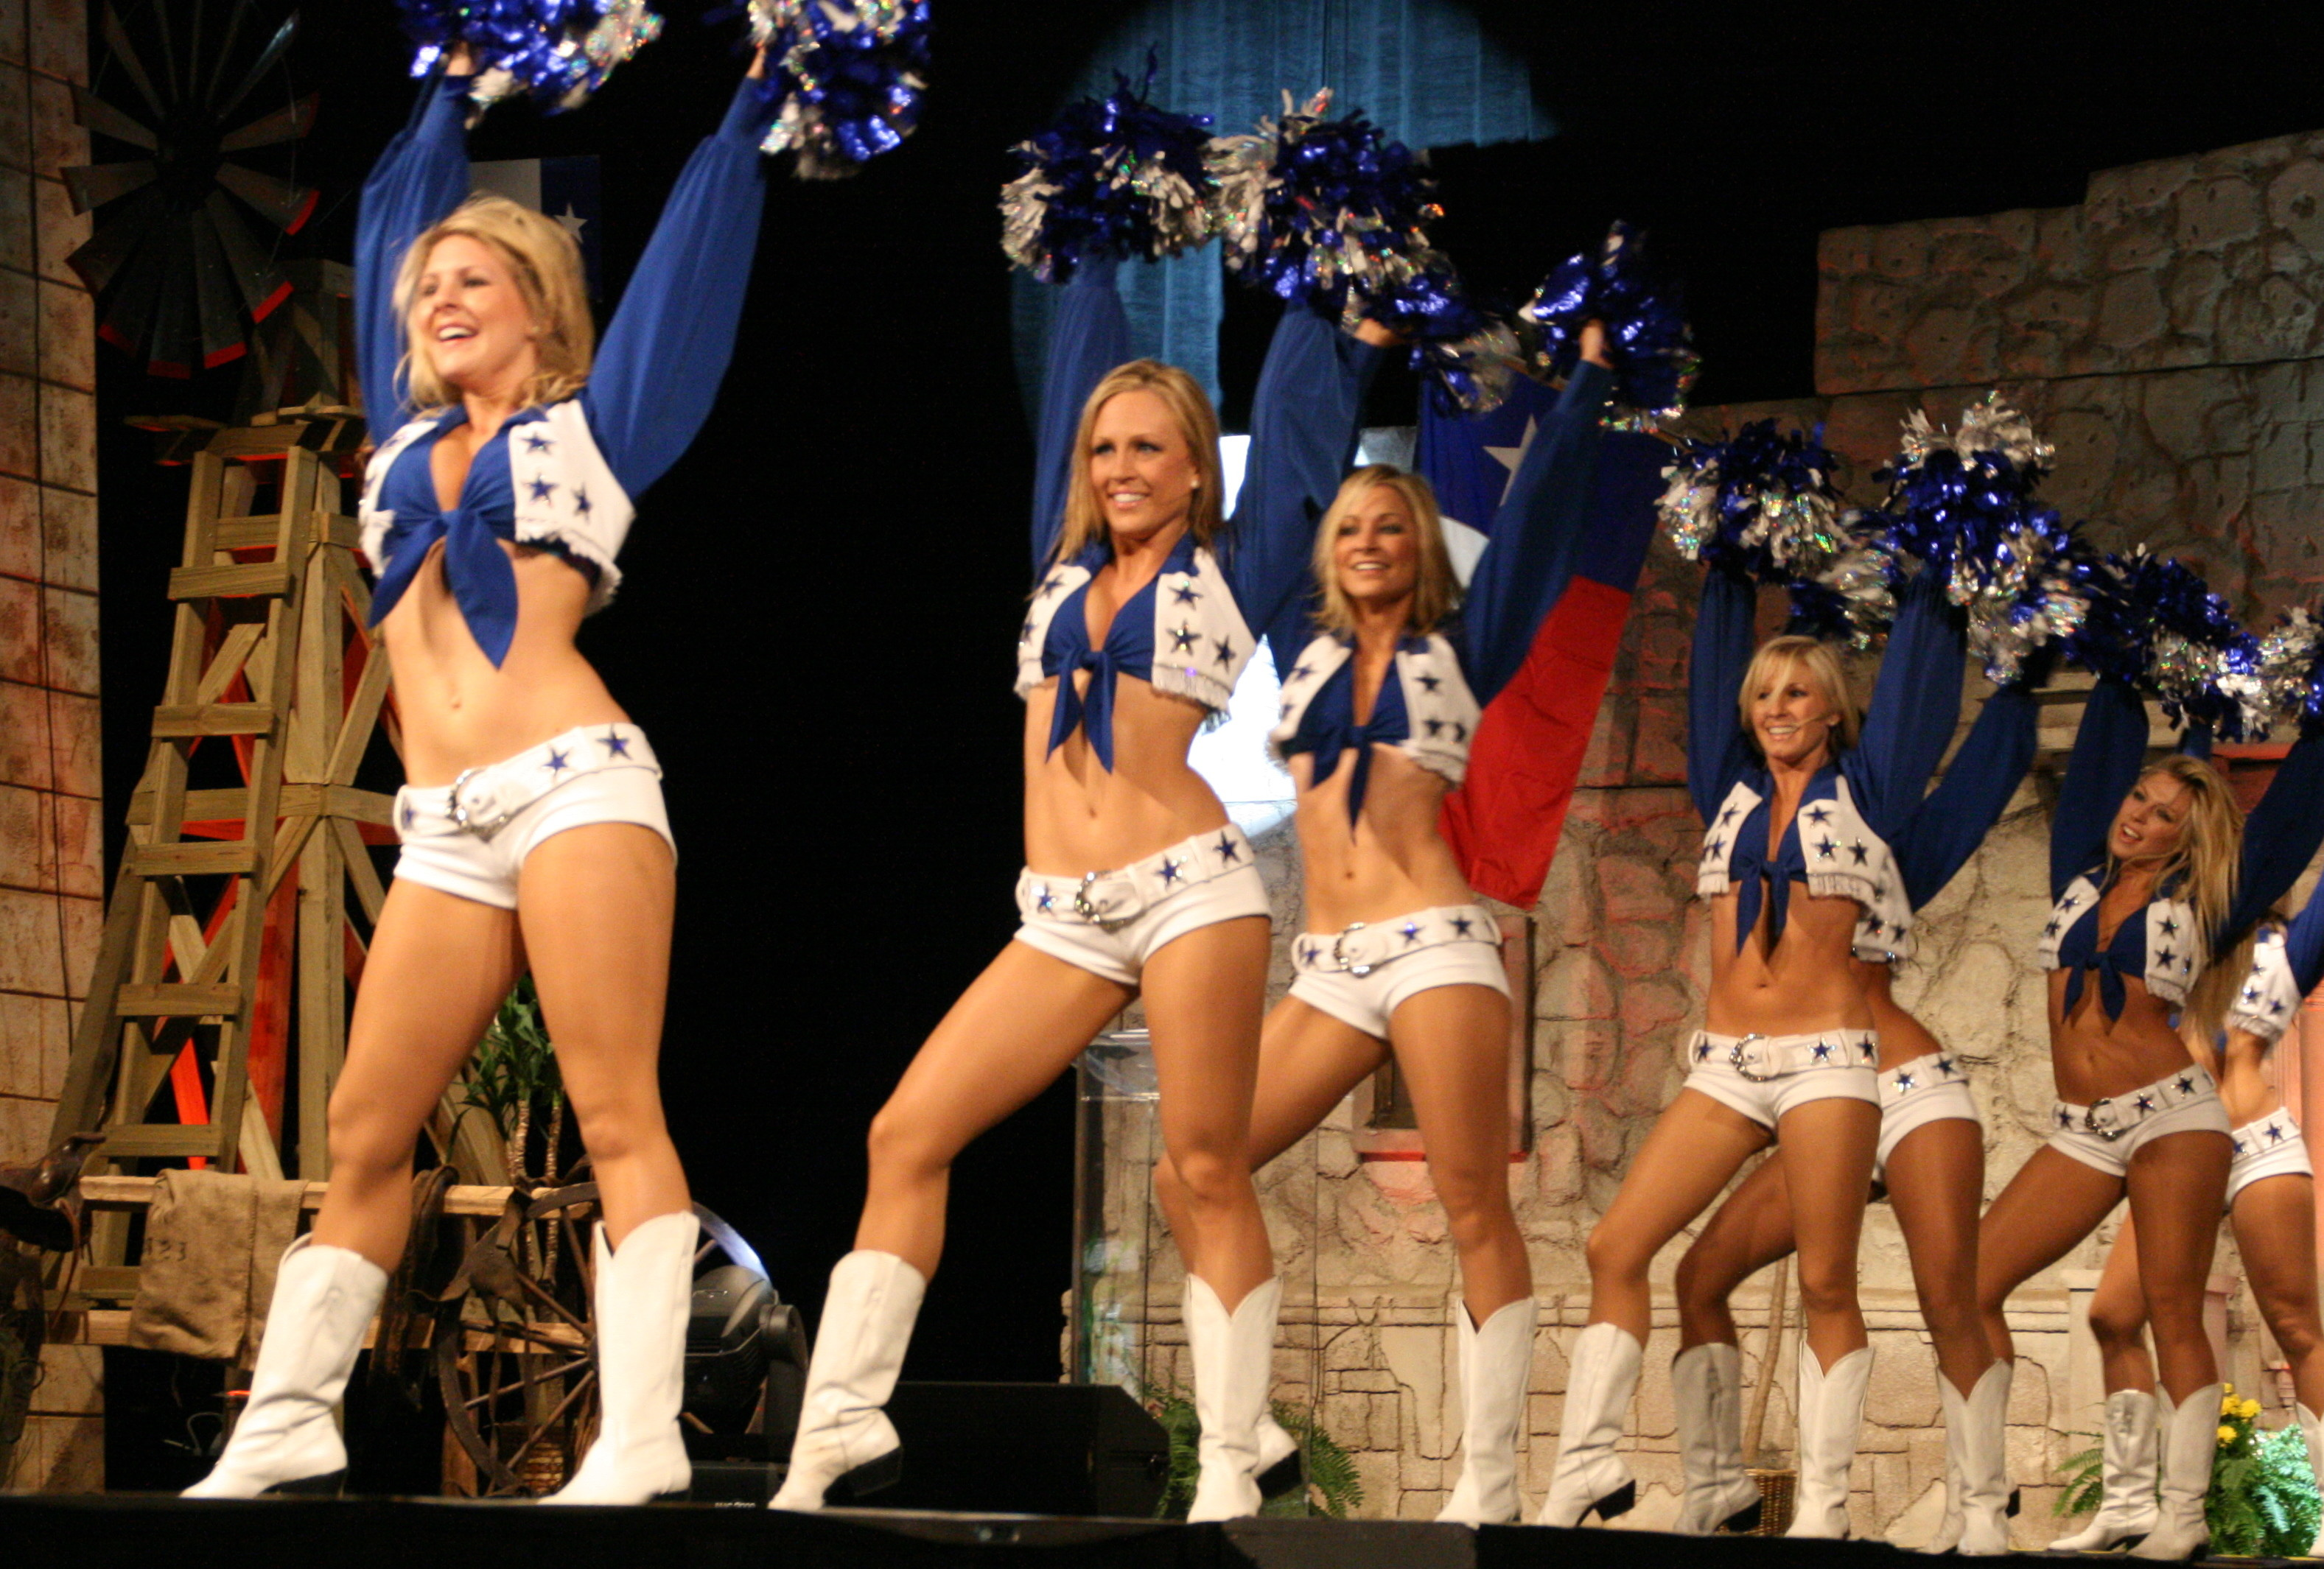 File:Dallas Cowboy Cheerleaders 4.jpg